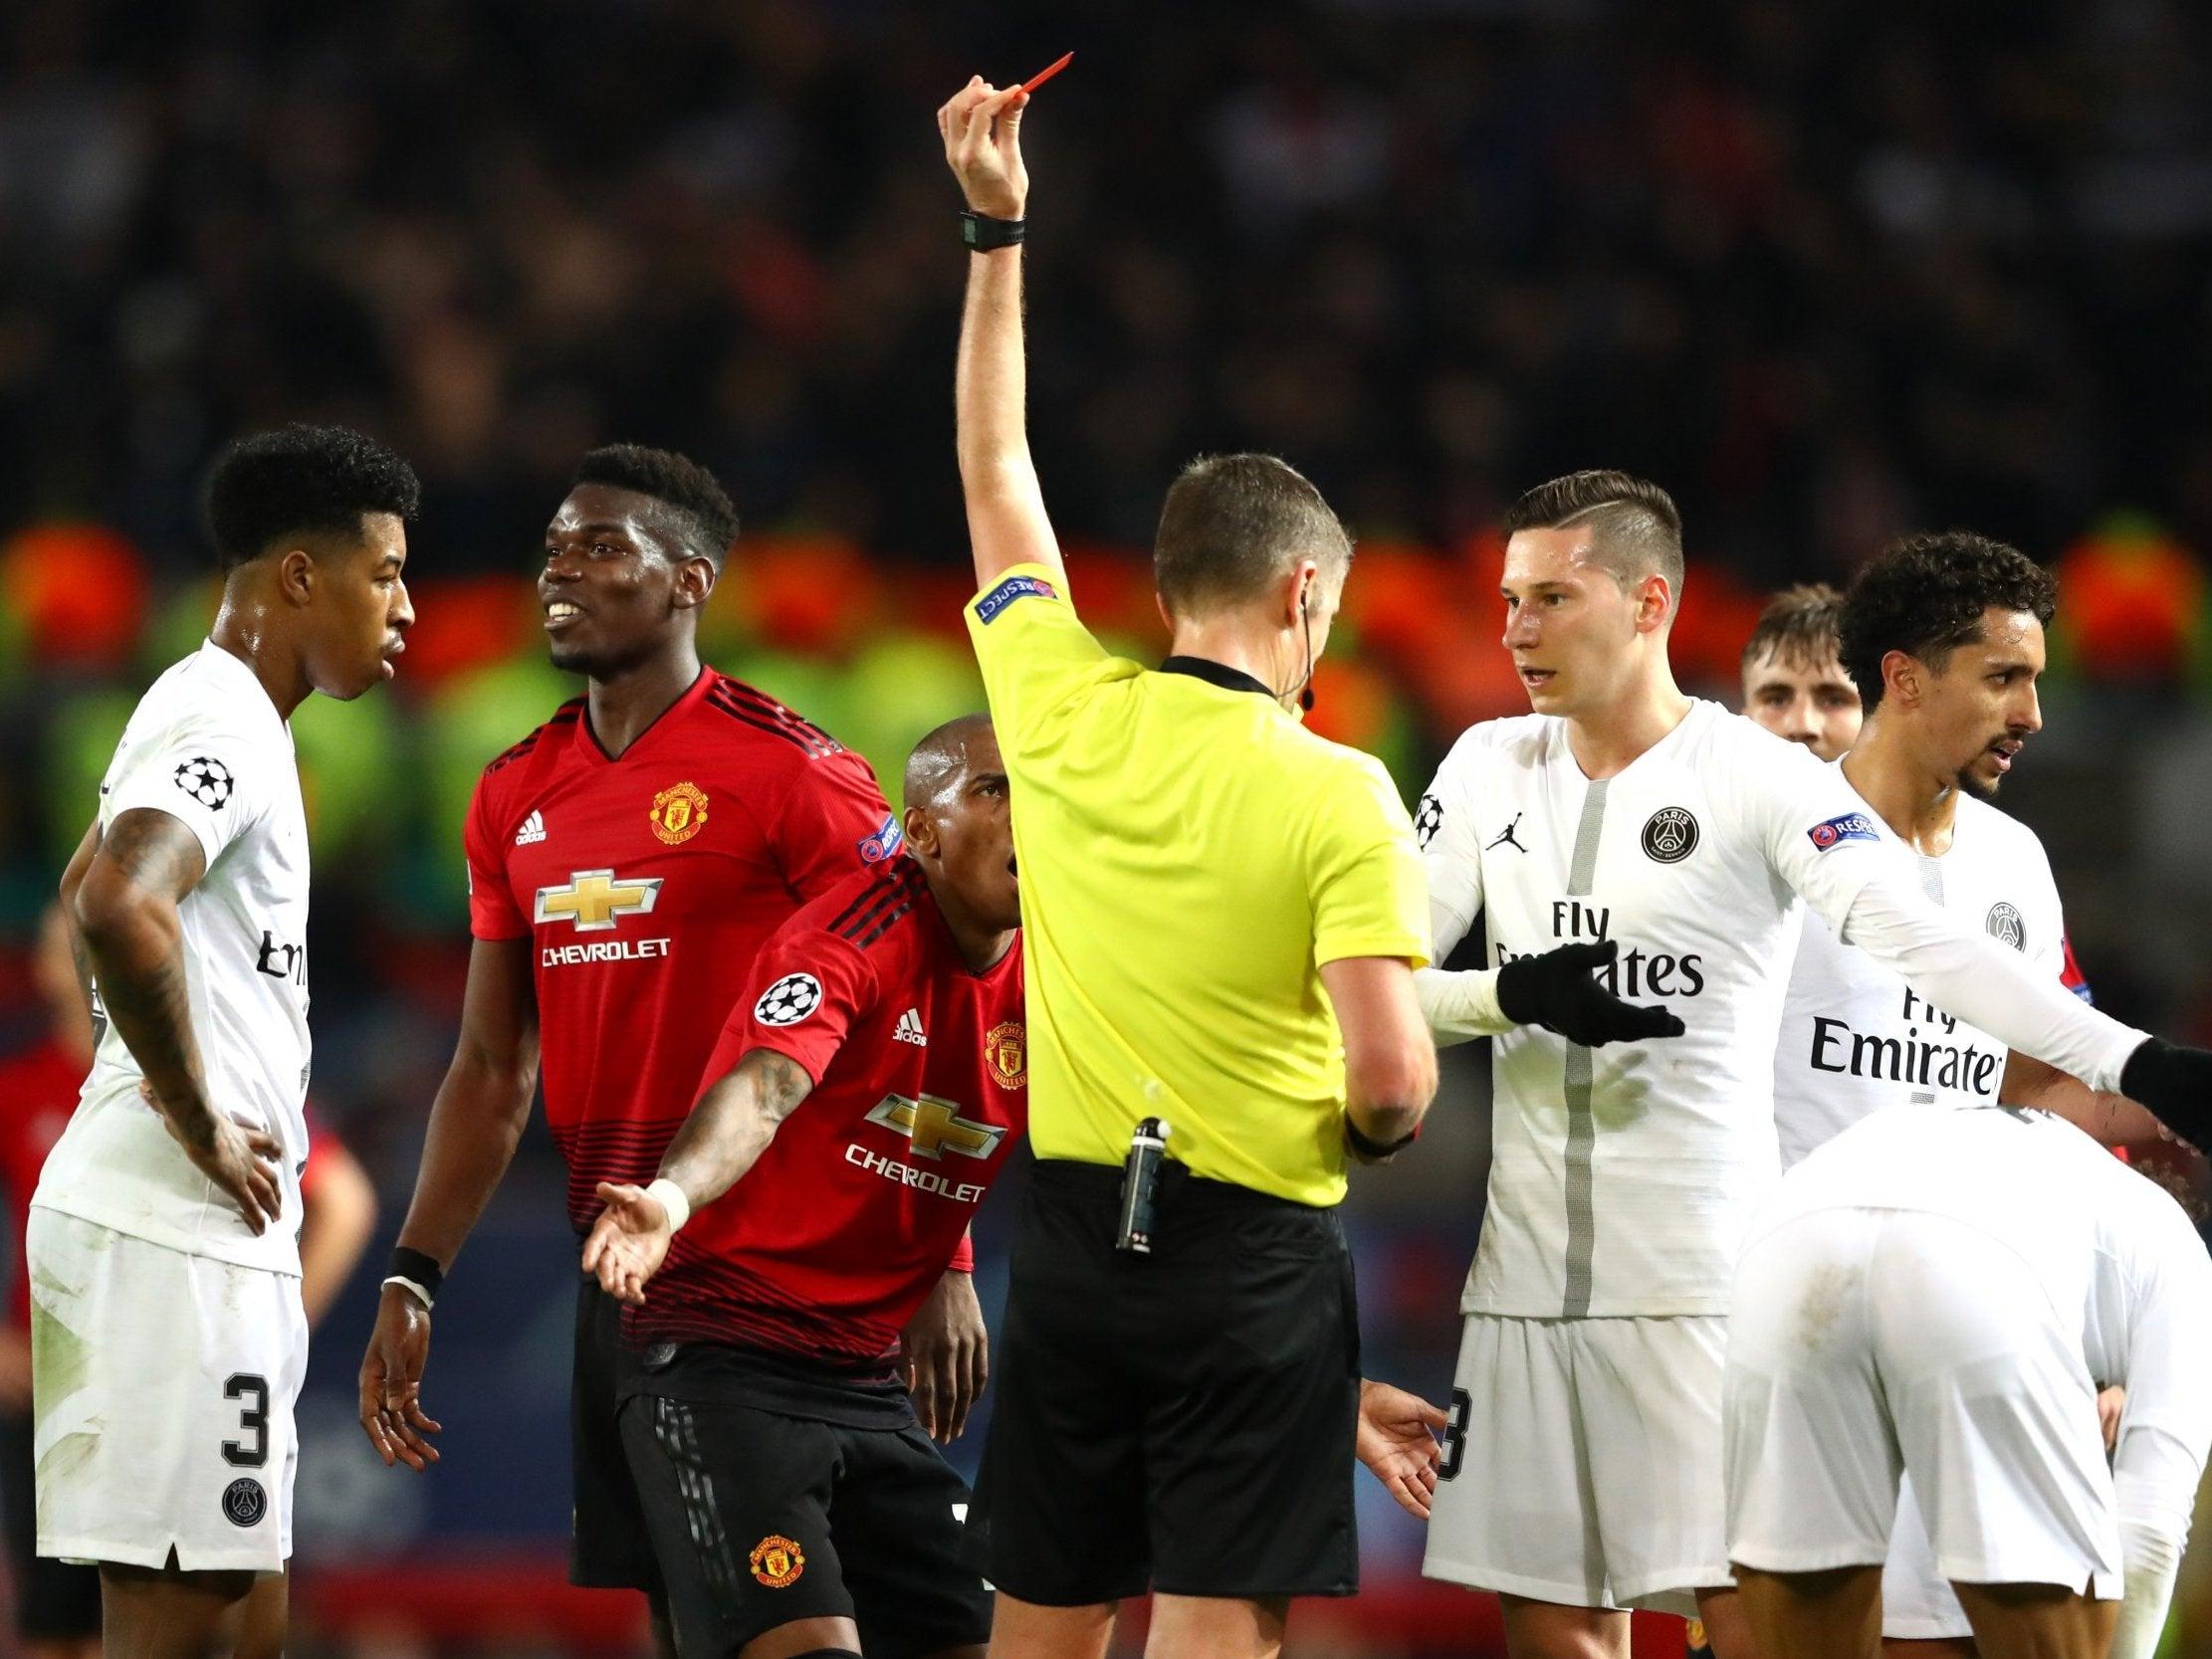 Man Utd Vs Psg Paul Pogba Shown Red Card After Nasty